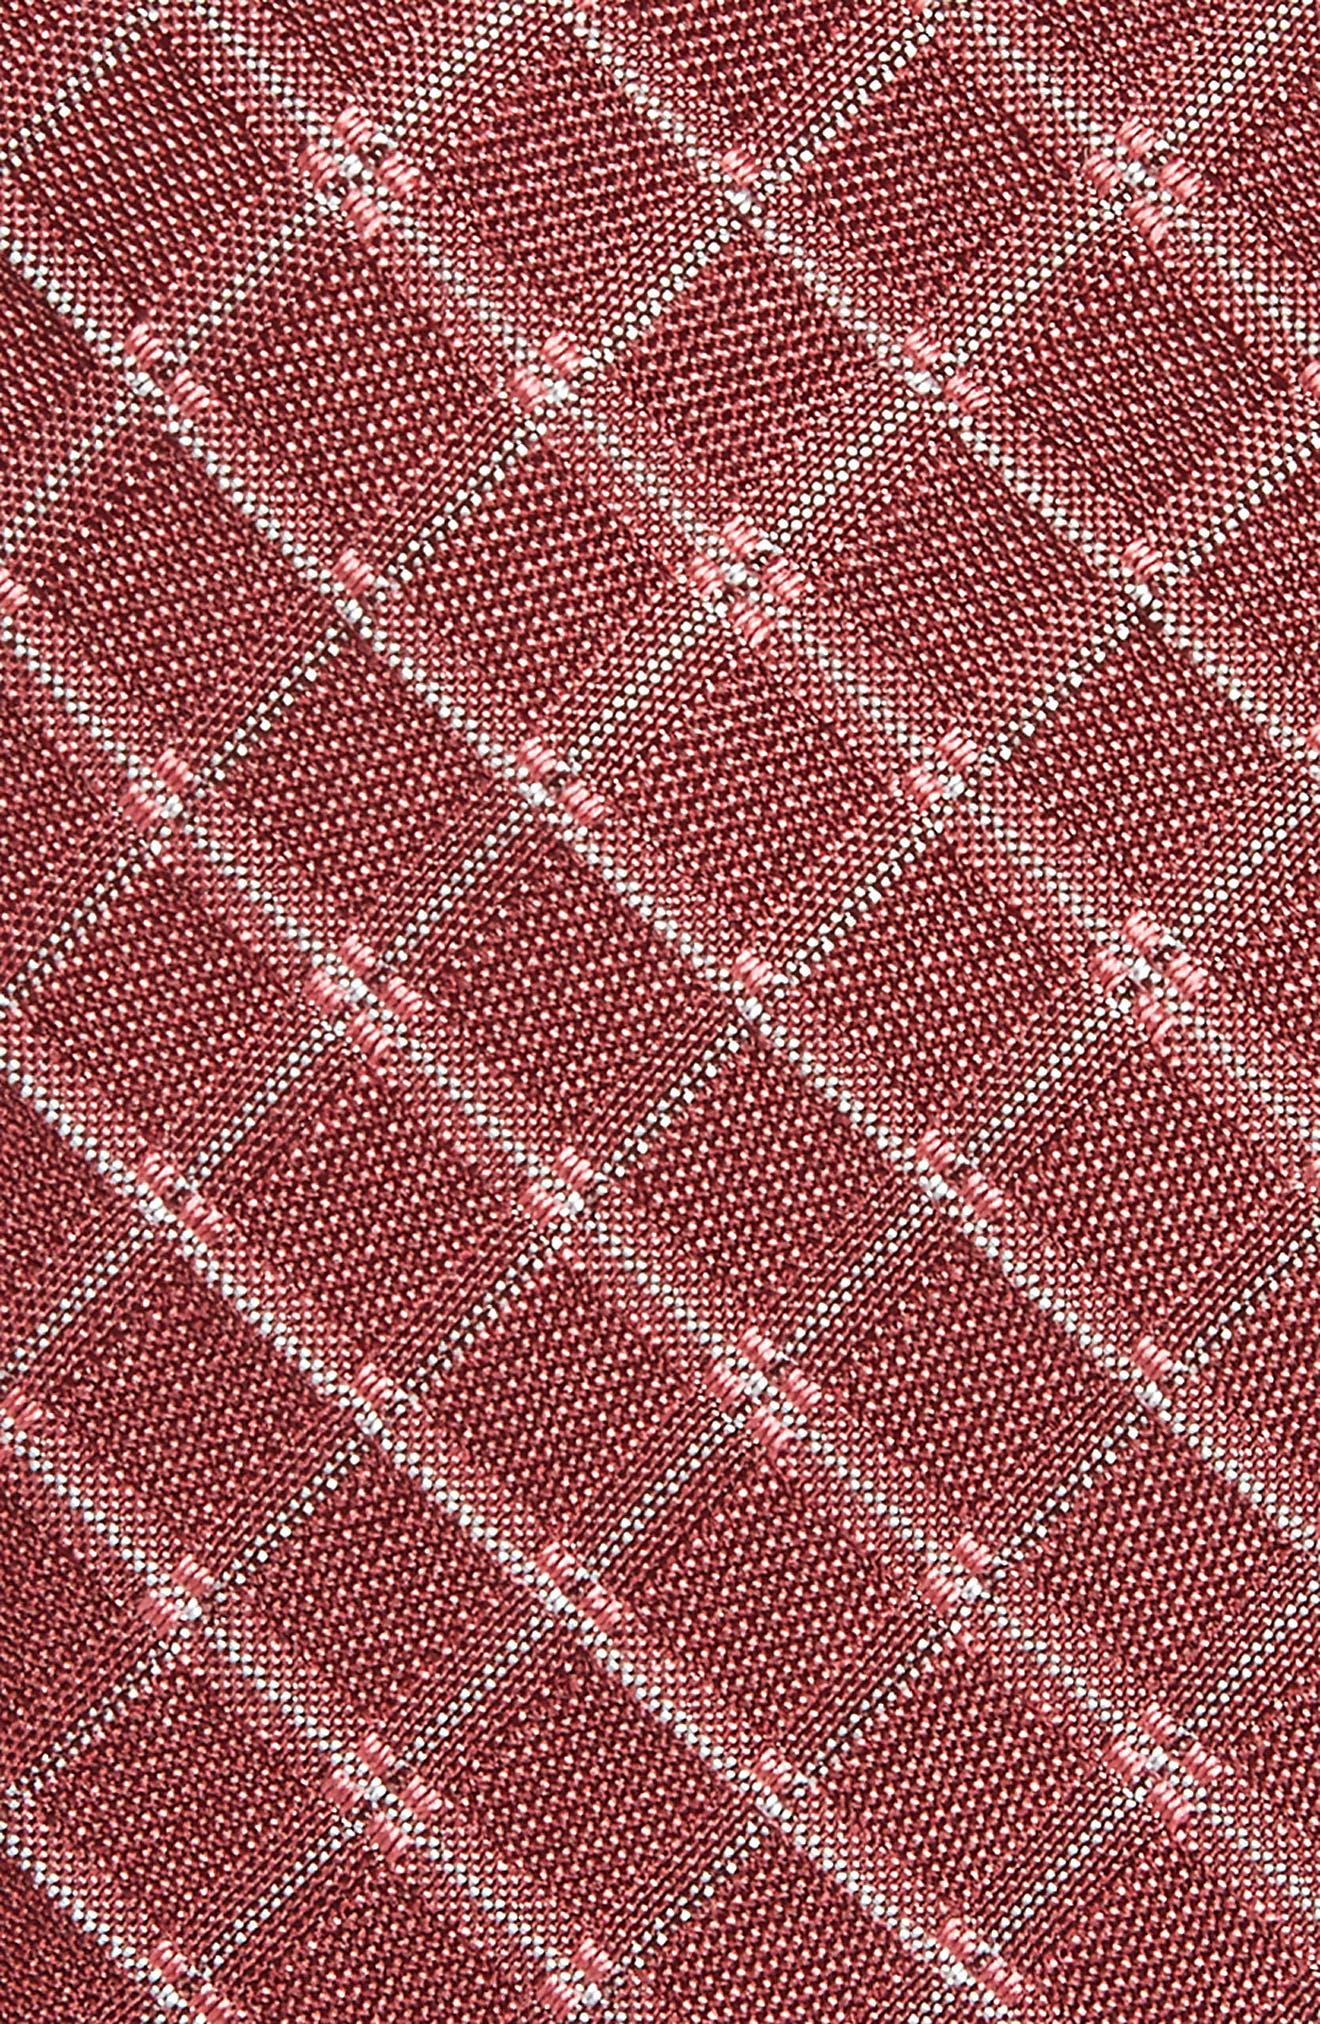 Plaid Silk Skinny Tie,                             Alternate thumbnail 2, color,                             Red